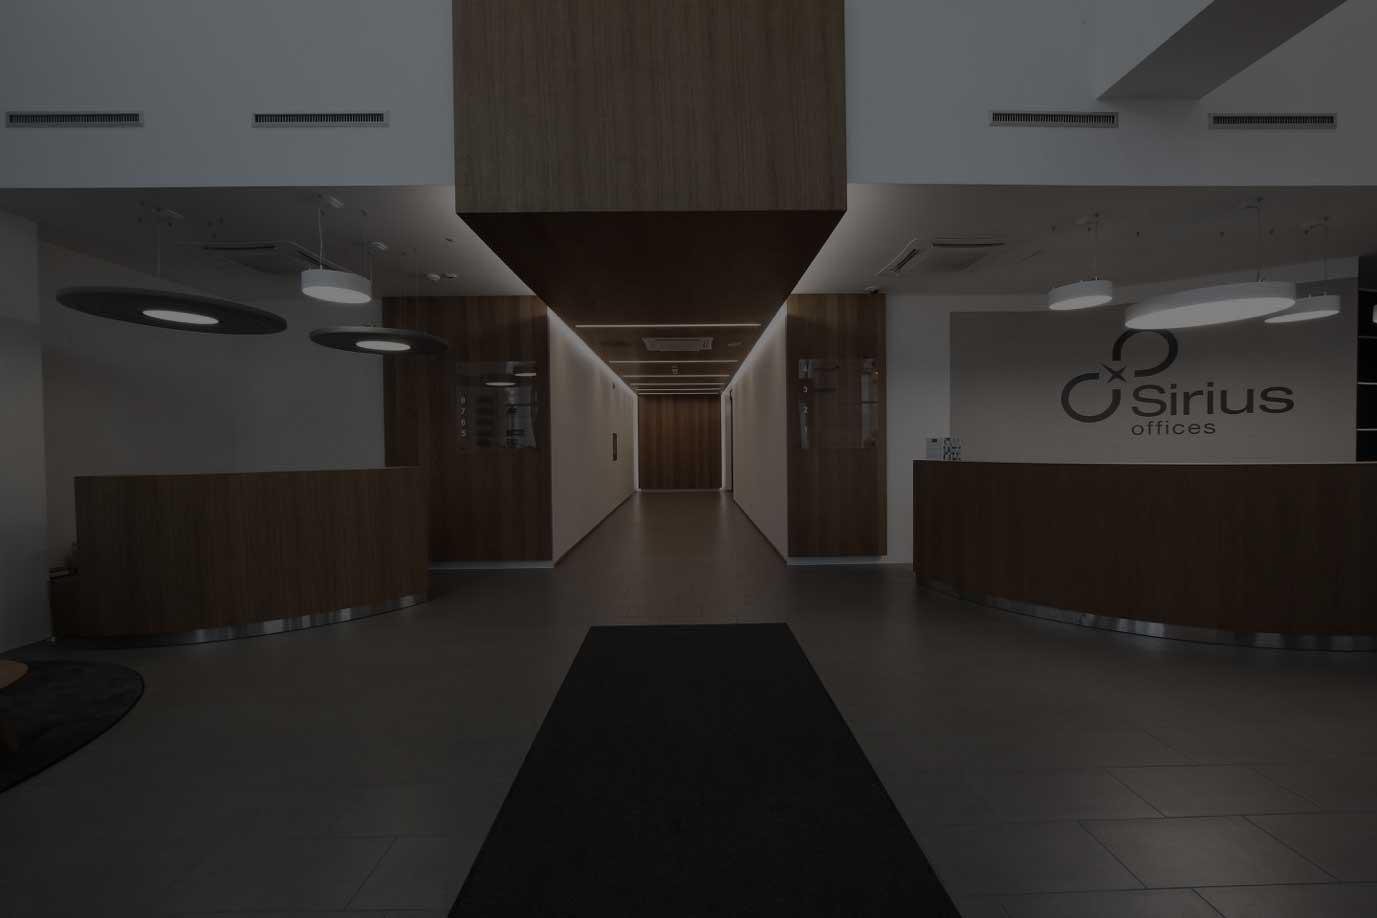 interior-01_dark